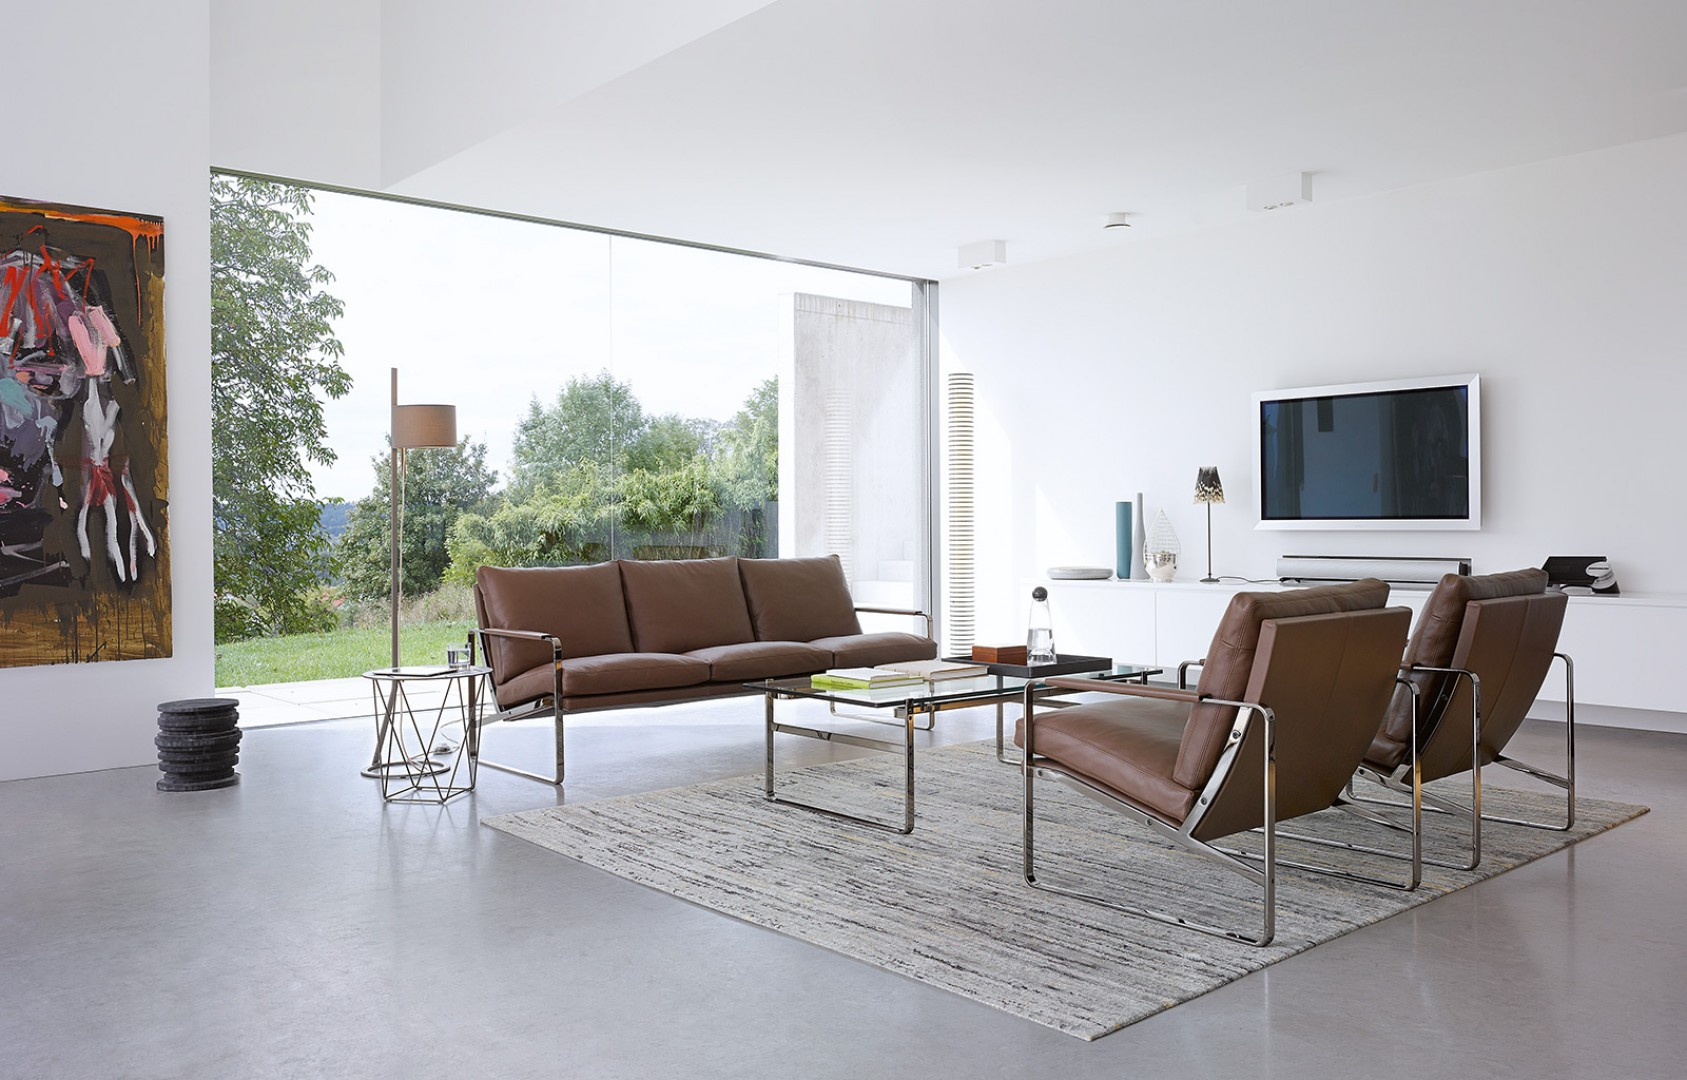 Sofa i fotele Fabricius firmy Walter Knoll. Fot. Walter Knoll